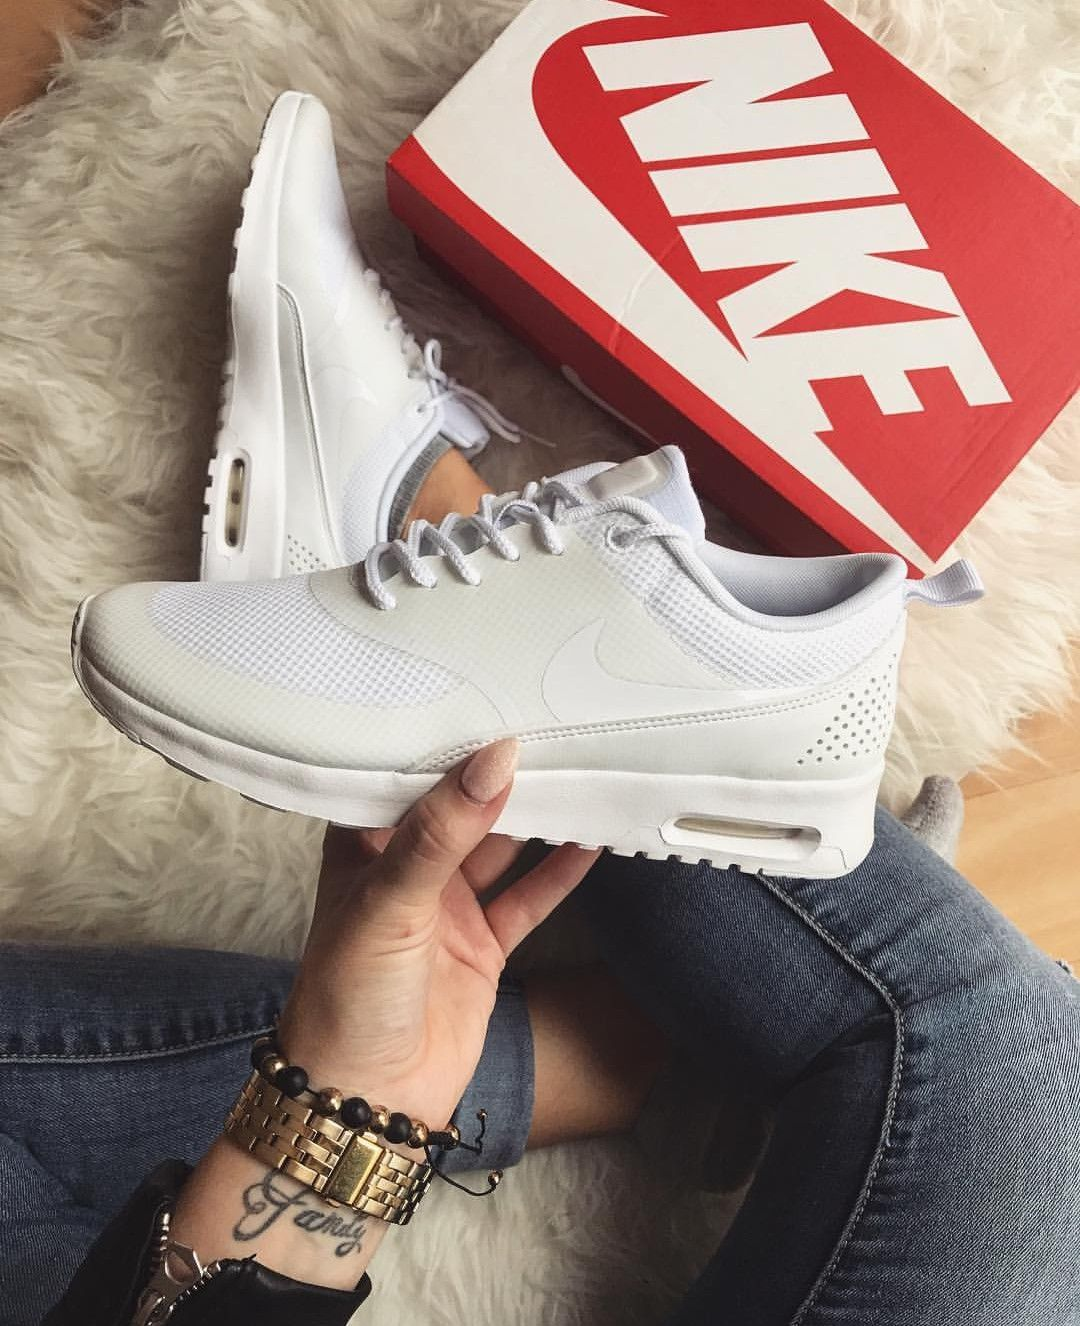 Nike Air Max Thea in weißwhite Foto: lucie_mat